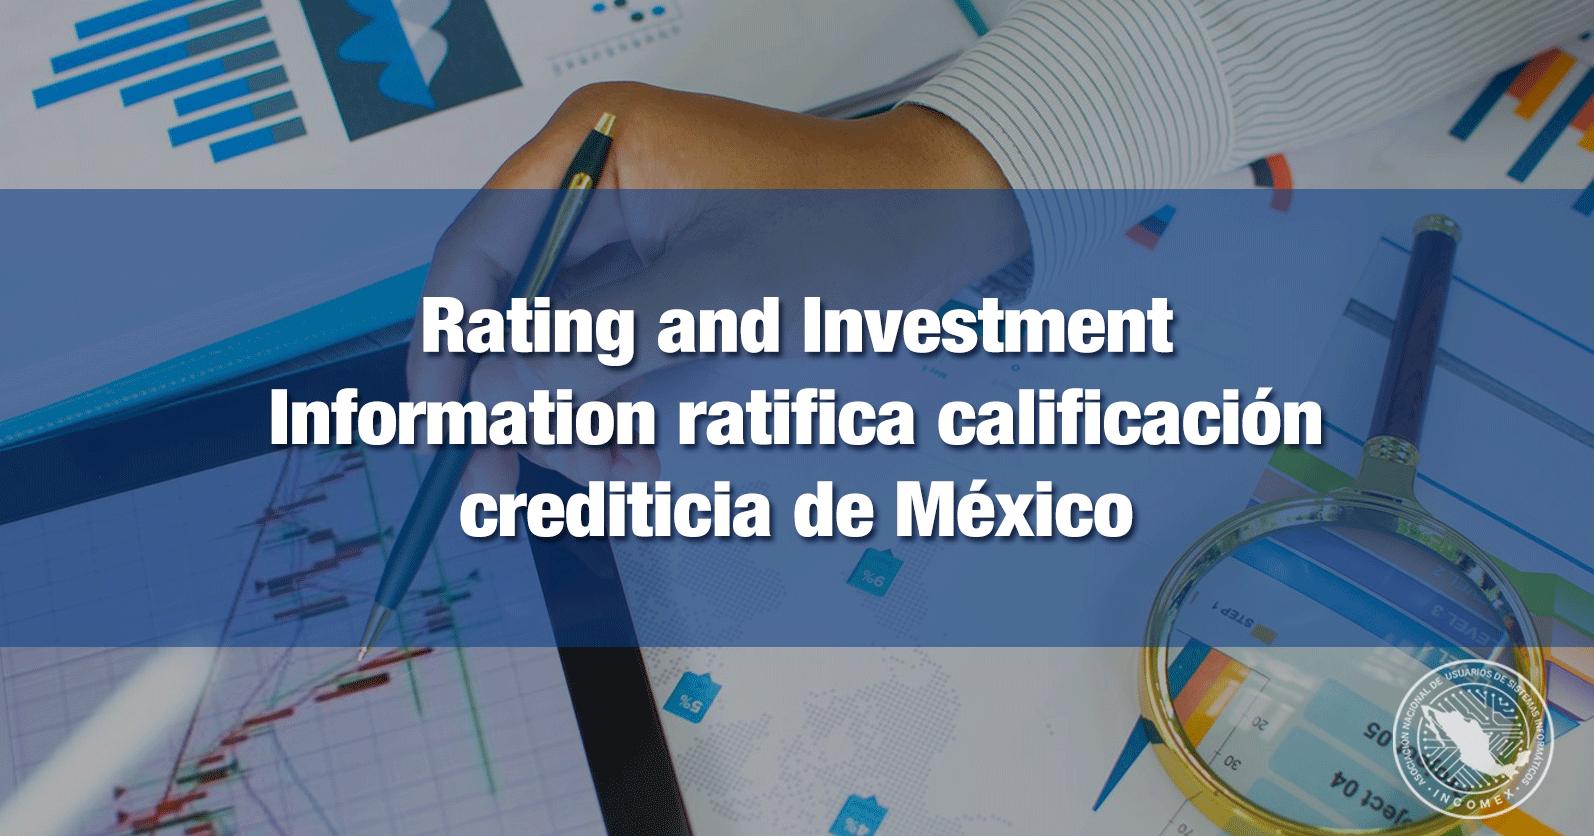 Rating and Investment Information ratifica calificación crediticia de México